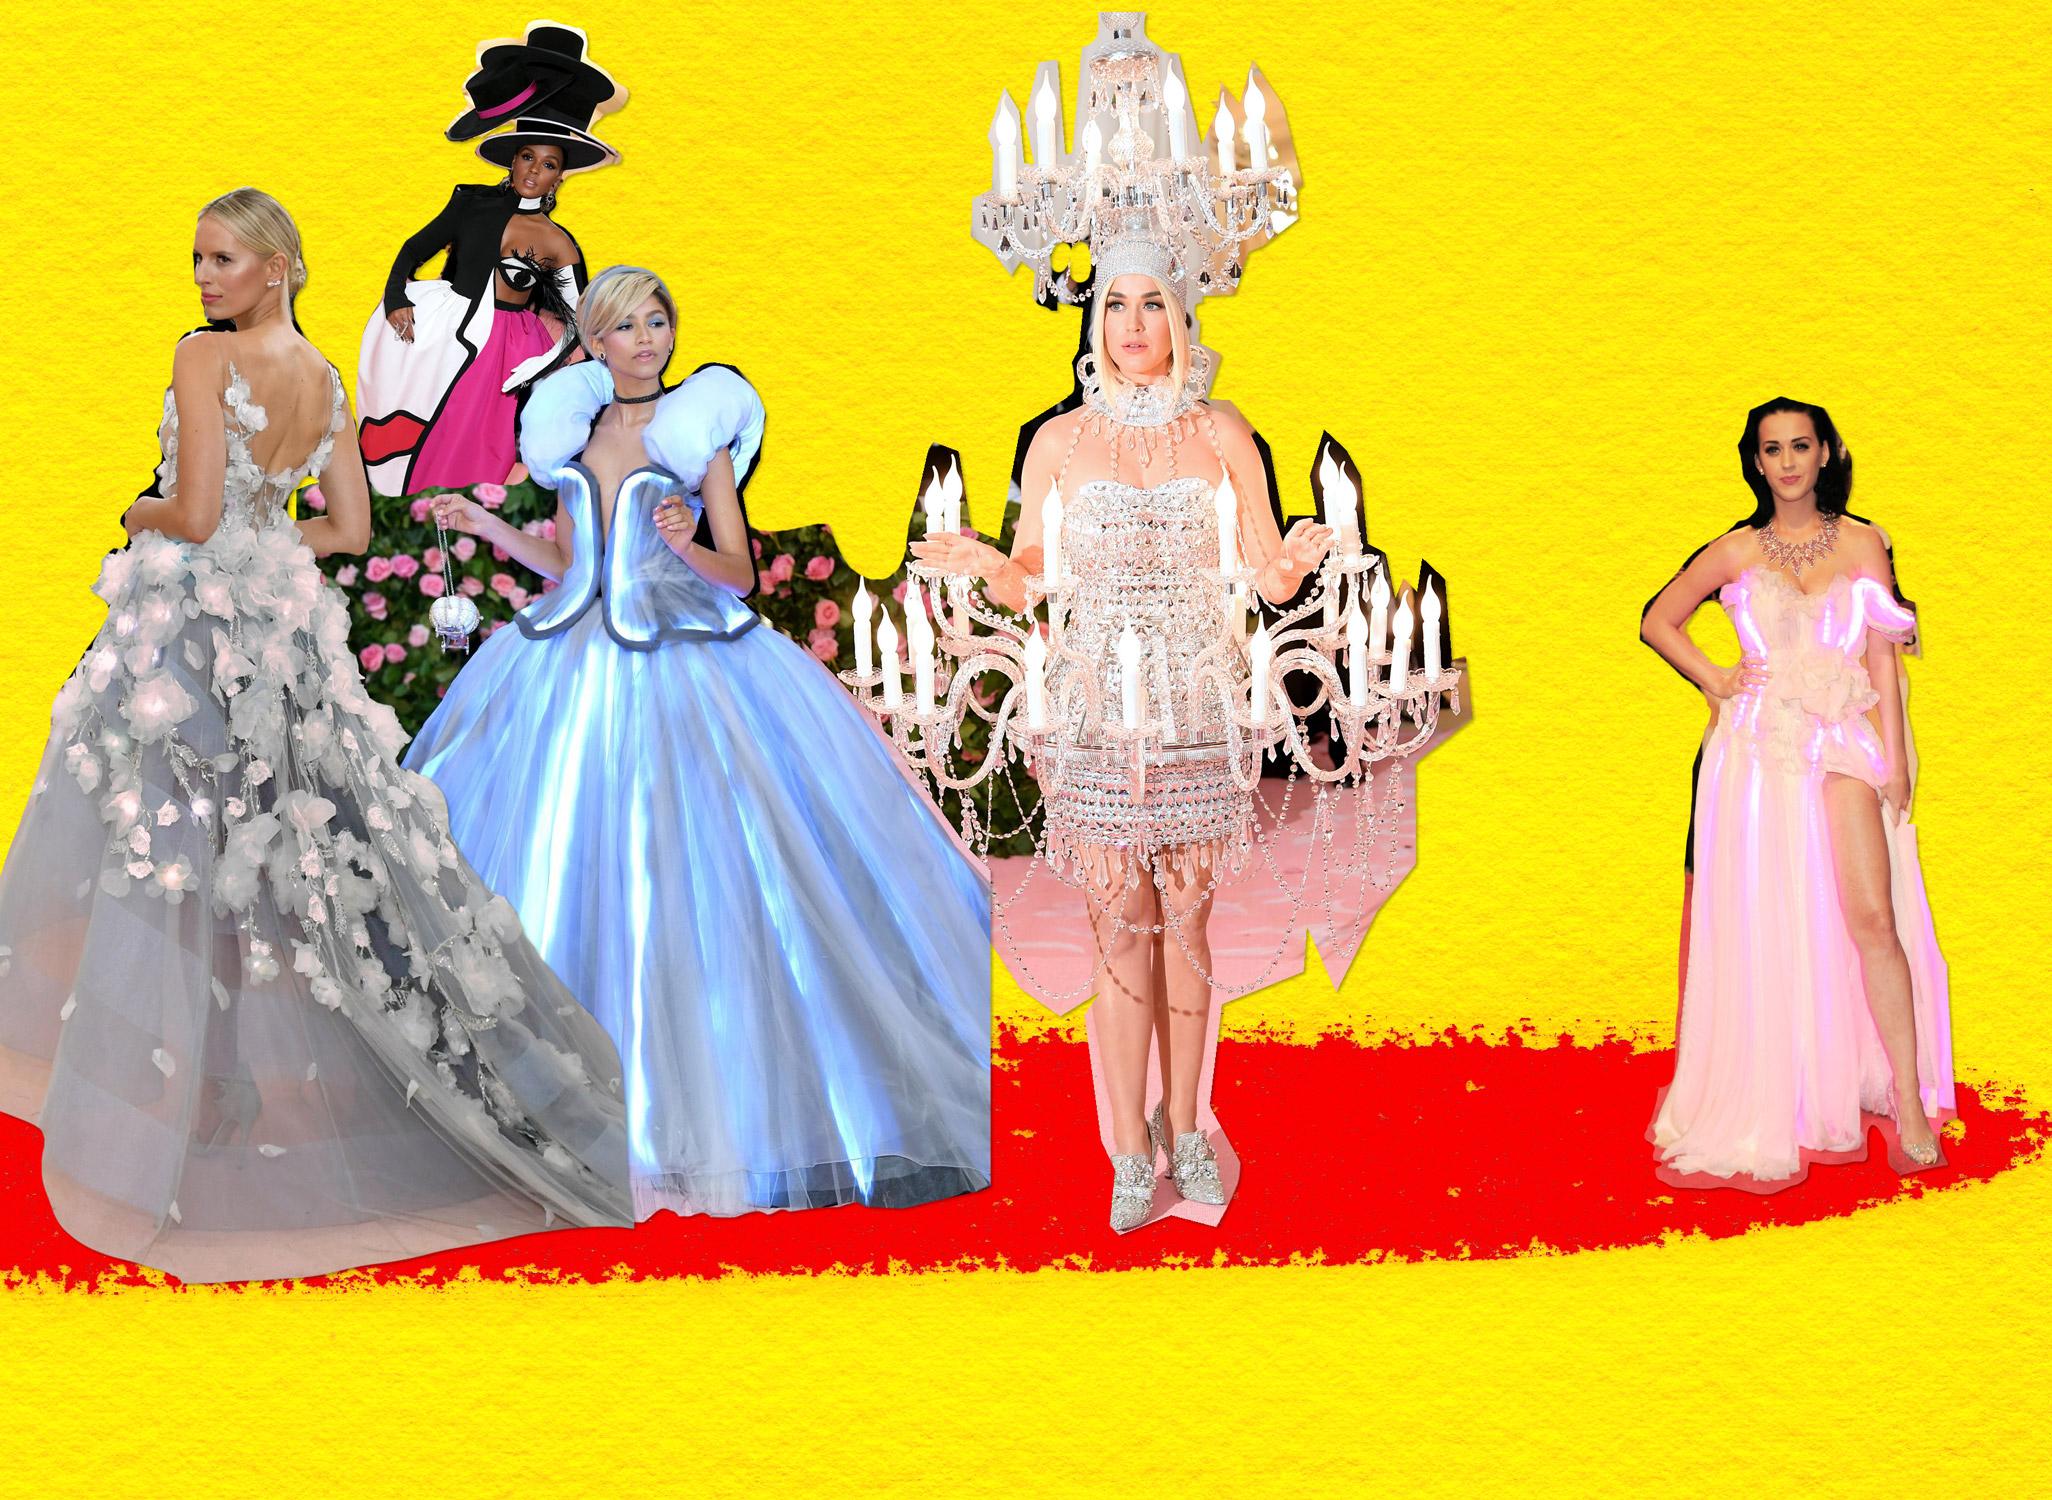 From left to right, Karolina Kurkova (Met Gala 2016), Janelle Monáe, Zendaya Coleman and Katy Perry (Met Gala 2019) and Katy Perry (Met Gala 2010)